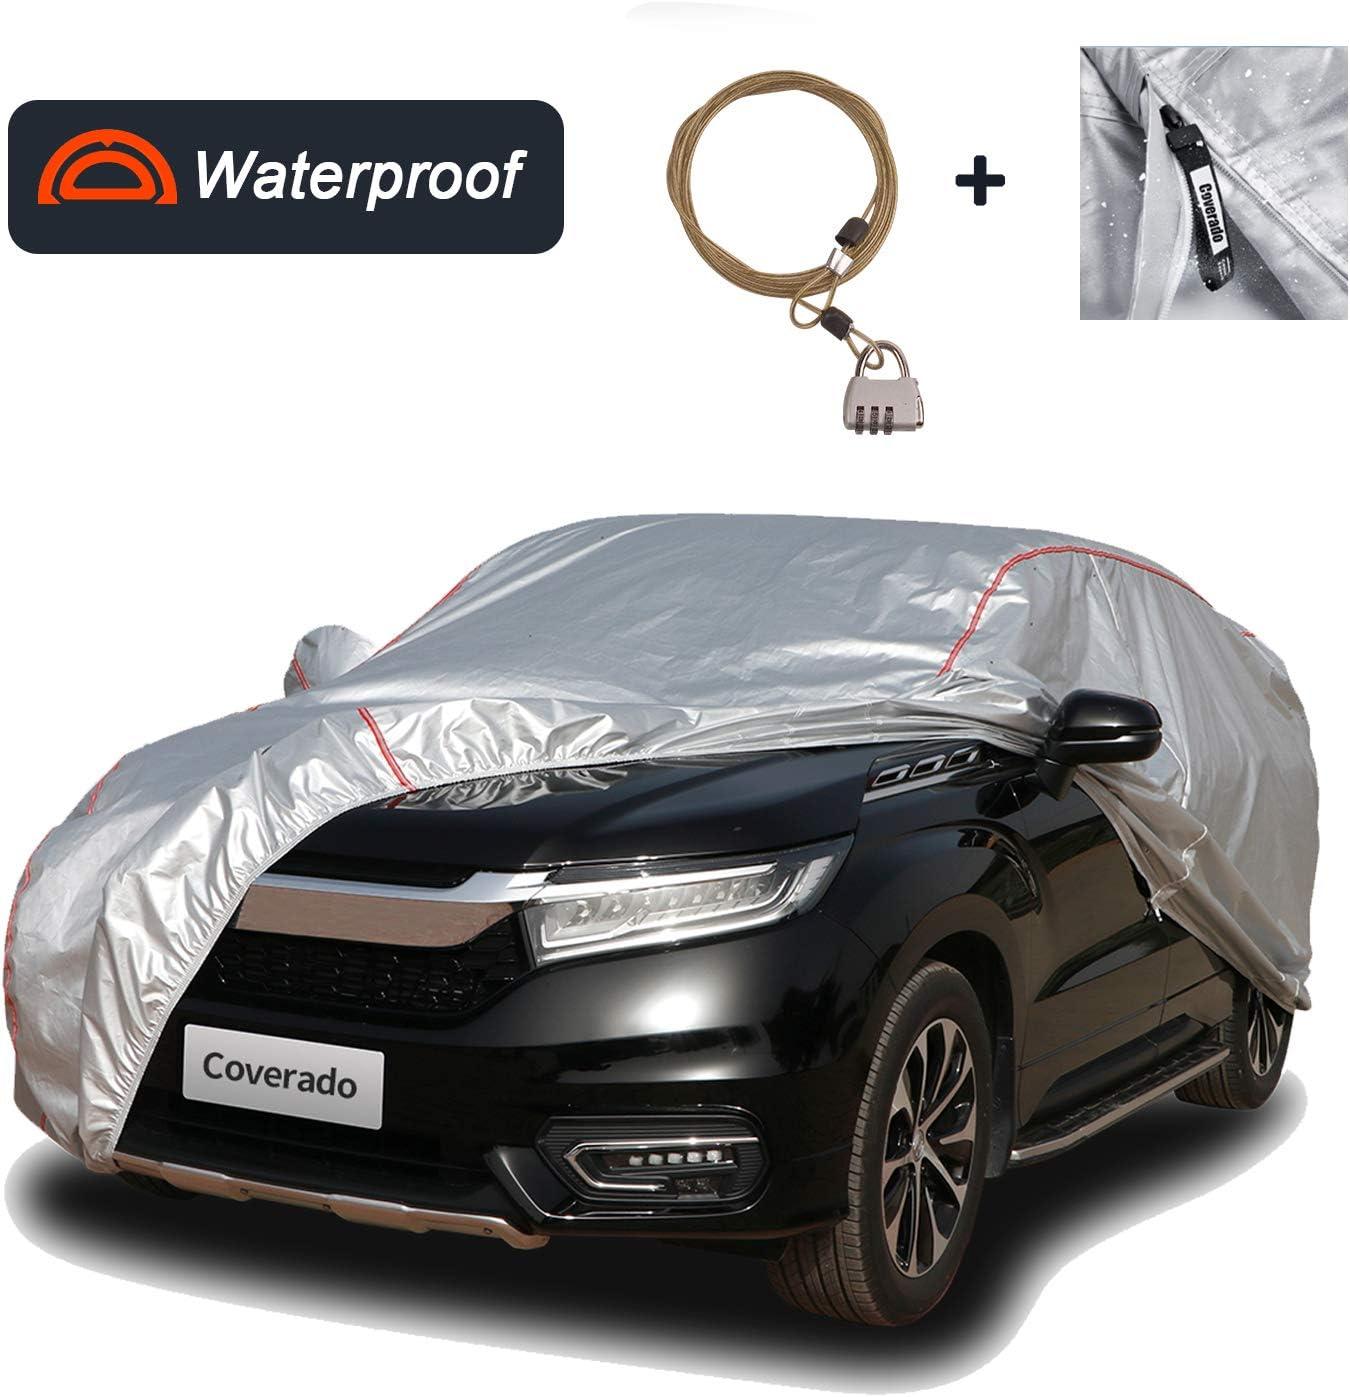 Coverado Deluxe Car Cover with Buid-in Door Storage Max 87% OFF W Alternative dealer Bag Zipper